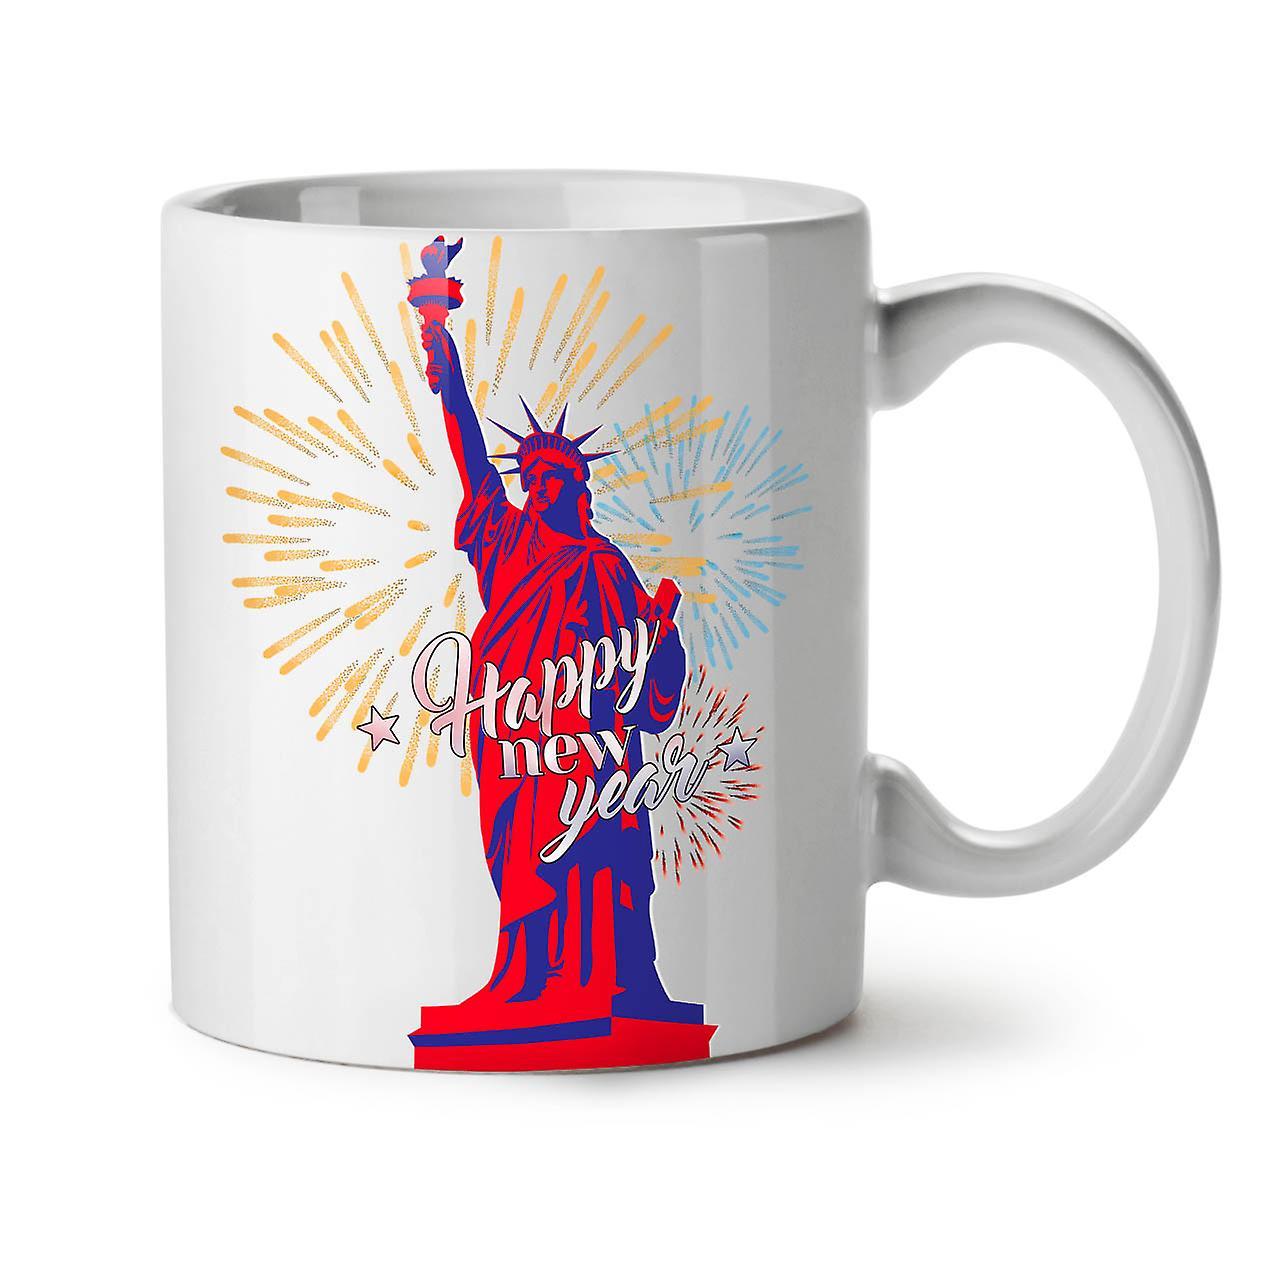 New Coffee 11 OzWellcoda Mug Freedom Ceramic Statue White Tea Year HWDbE2IY9e